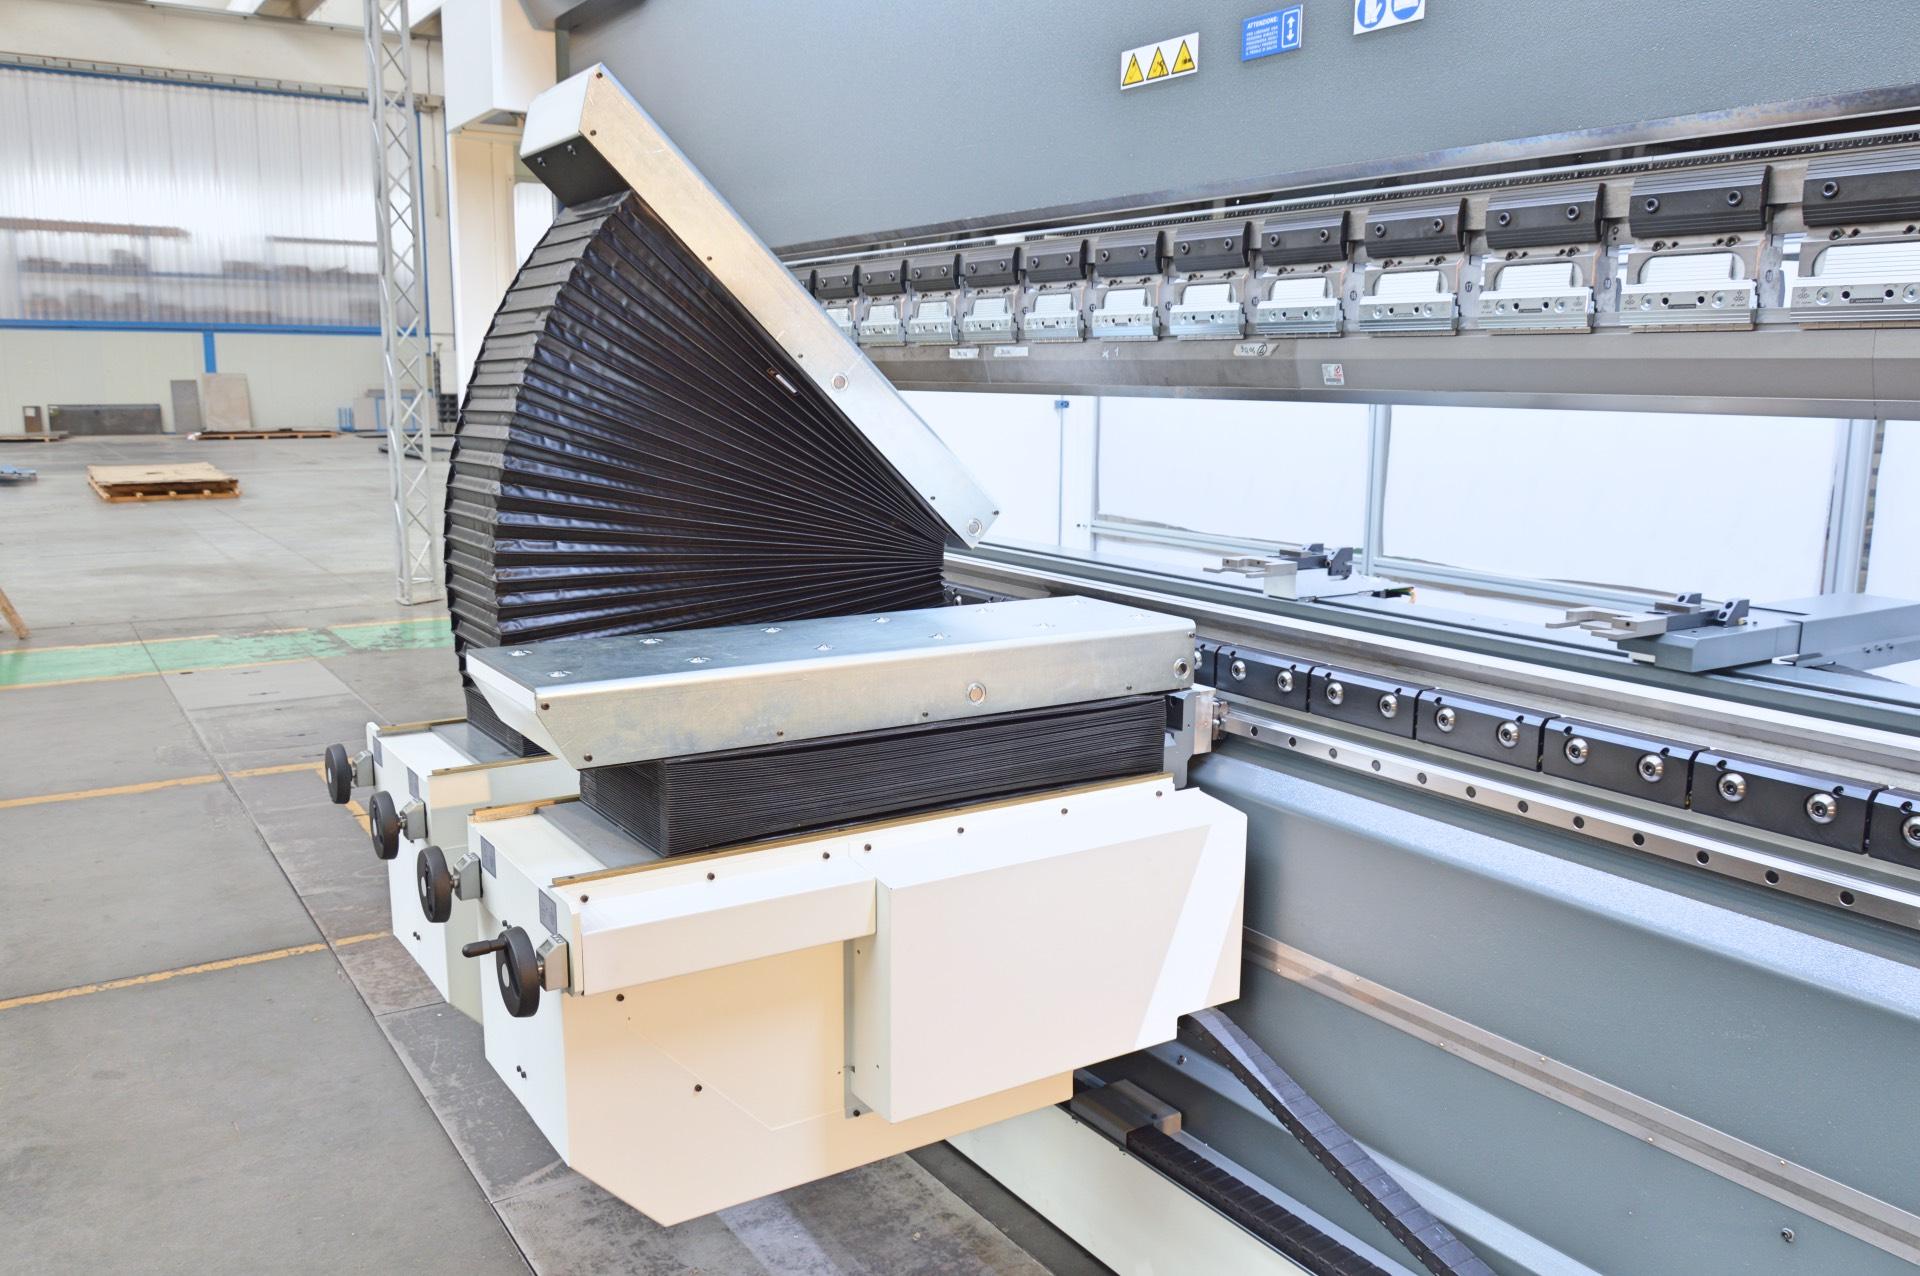 levantadores eléctricos 2 ejes prensa plegadora